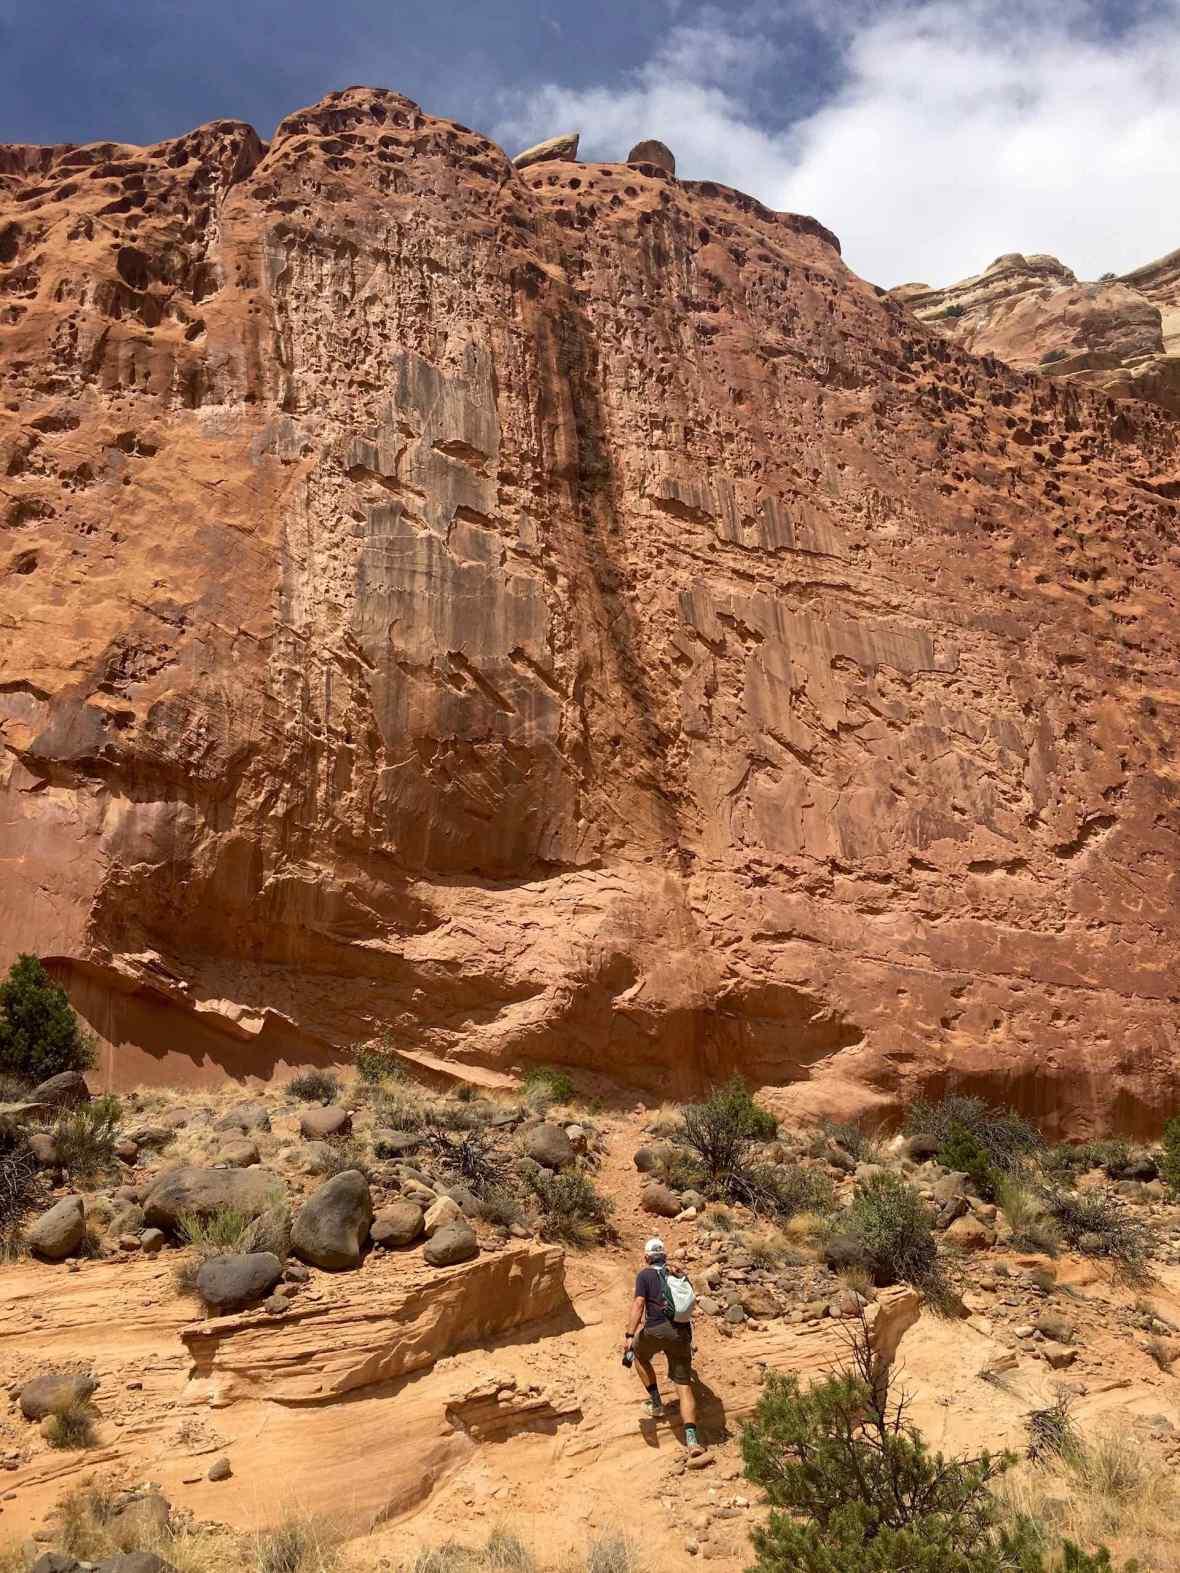 Scrambling up the sandy slop toward the Pleasant Creek trail petroglyphs